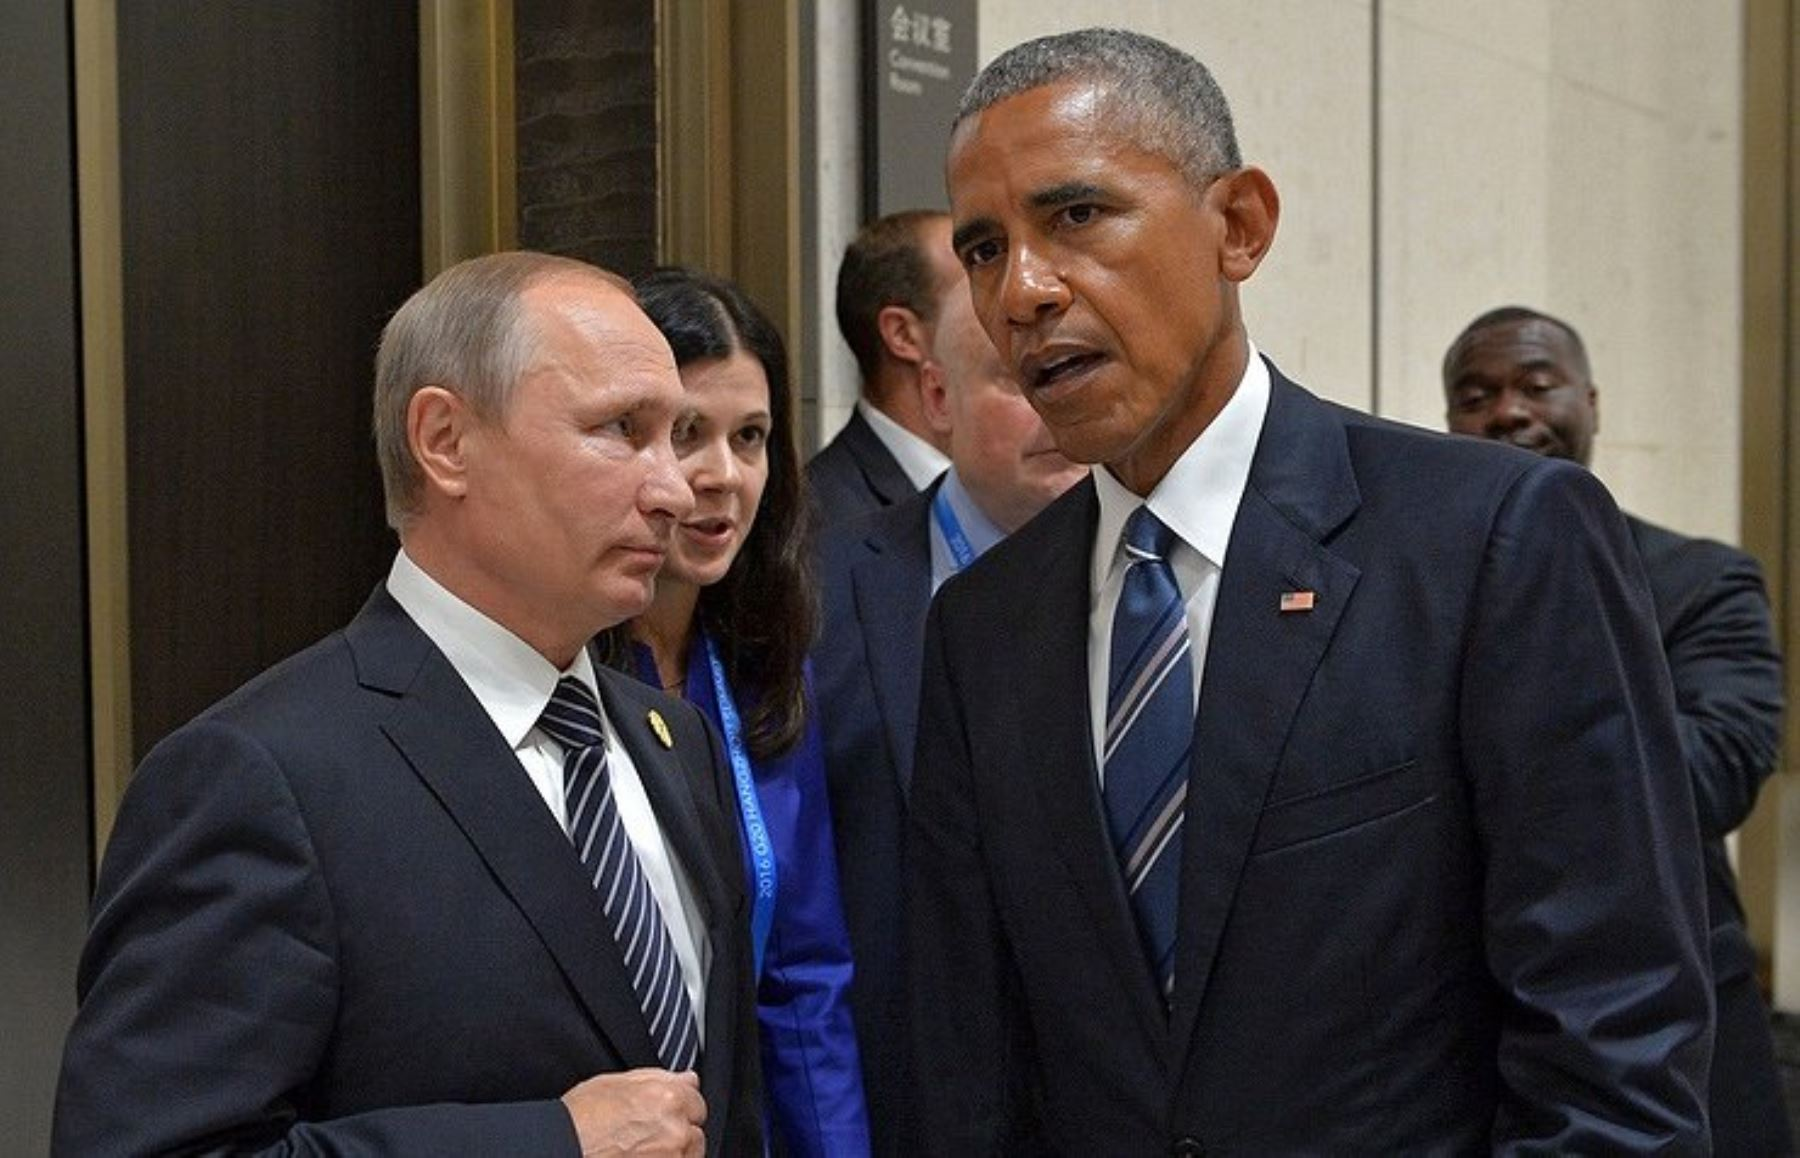 foto 2 putin y obama.jpg